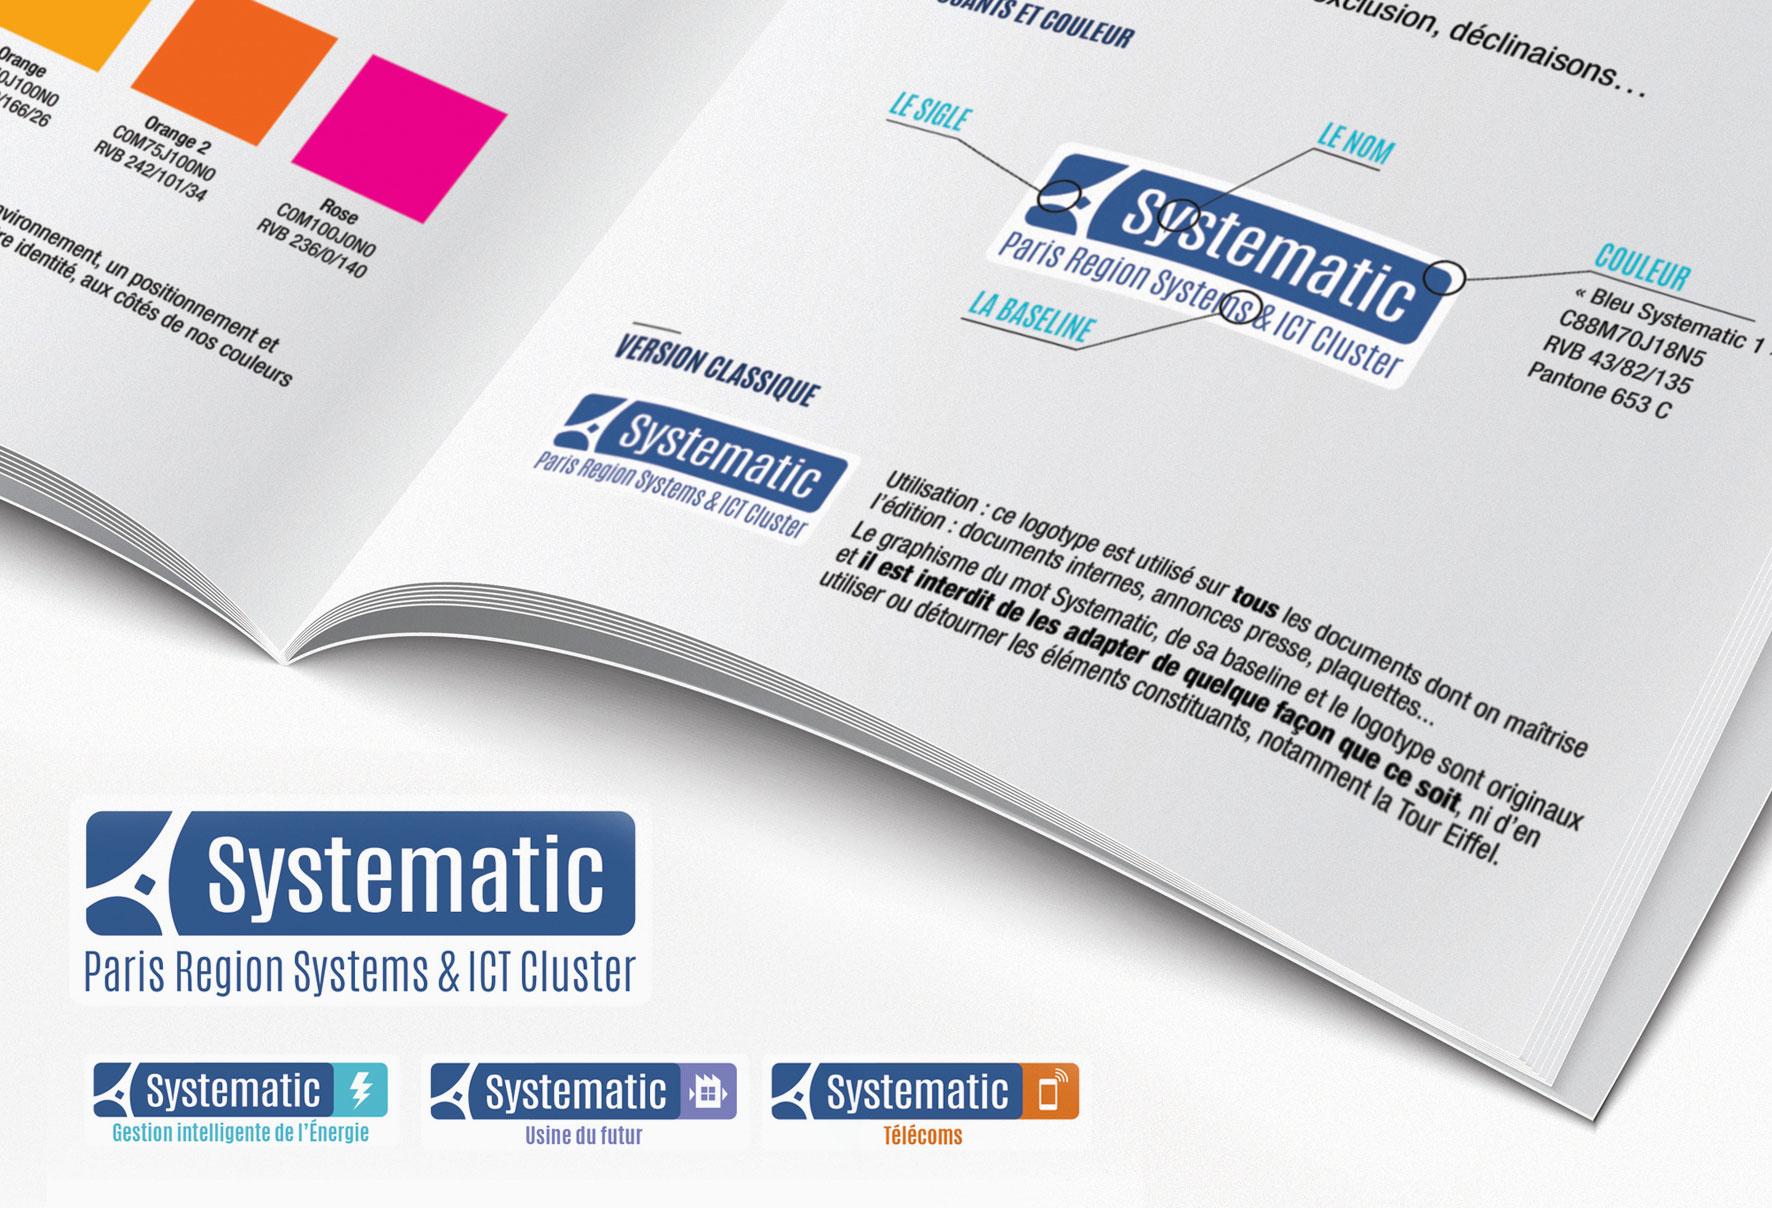 Logo-brand-design-charte-graphique-systematic-paris-region-idees-fraiches-w